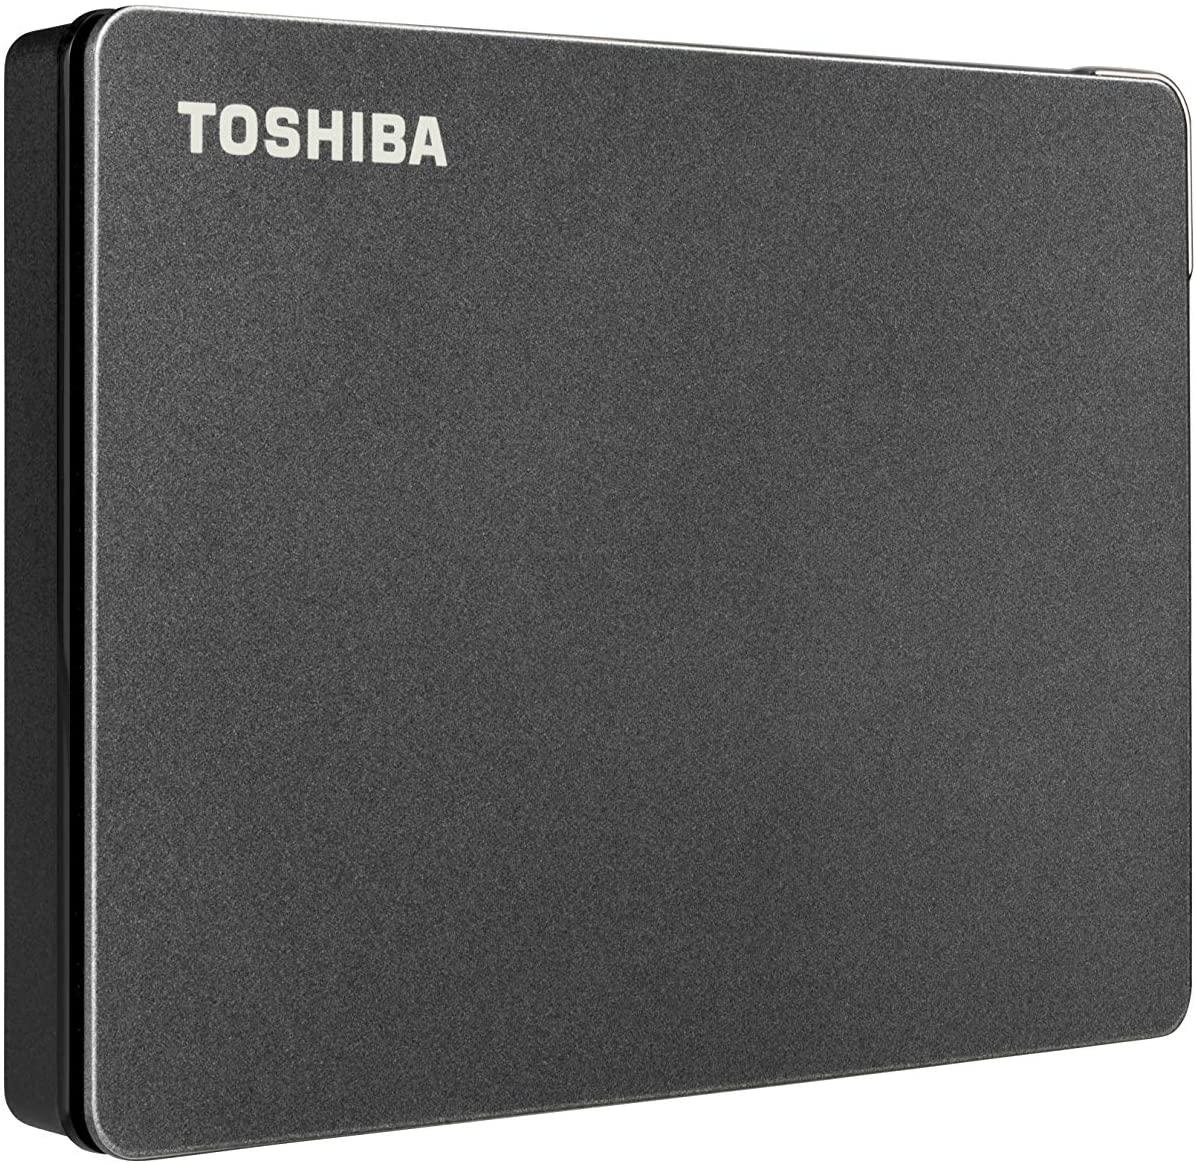 Toshiba Canivo Gaming